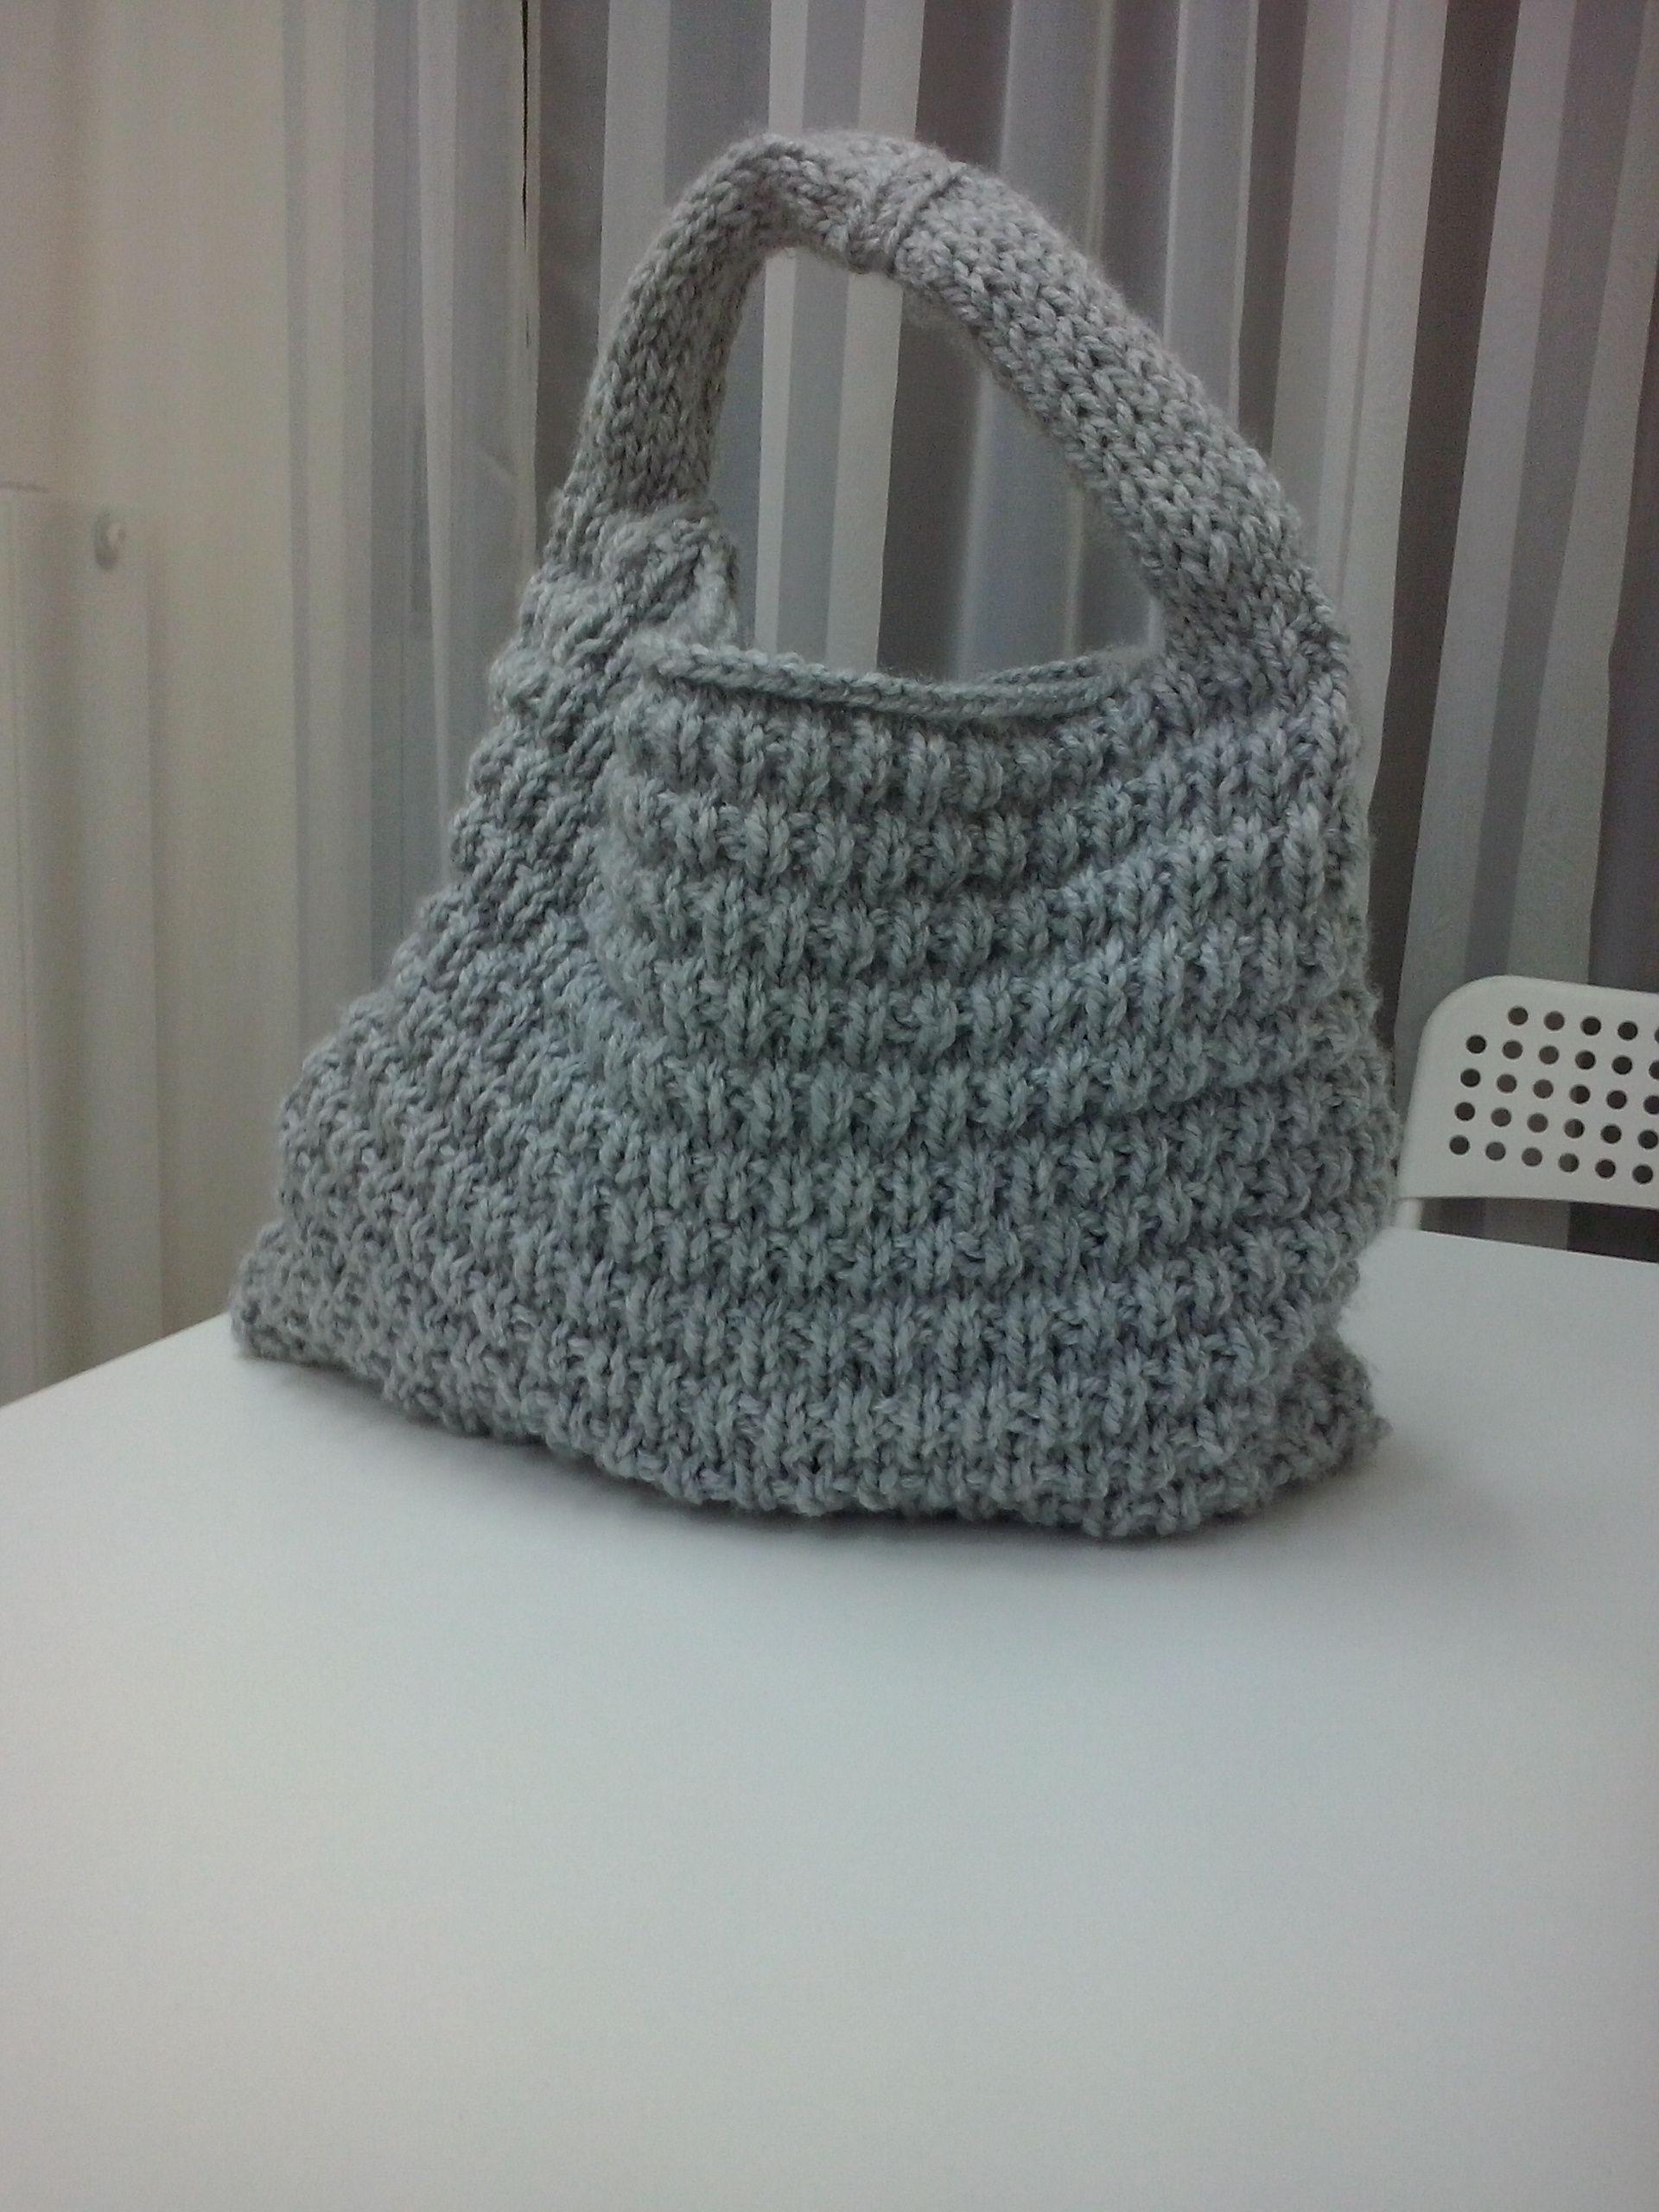 e689ec3a8be Υπέροχη τσάντα πλεκτή της Κ πλεγμένη με κυκλικές βελόνες.Σεμινάριο Πλέξιμο  με Βελόνες Γ΄